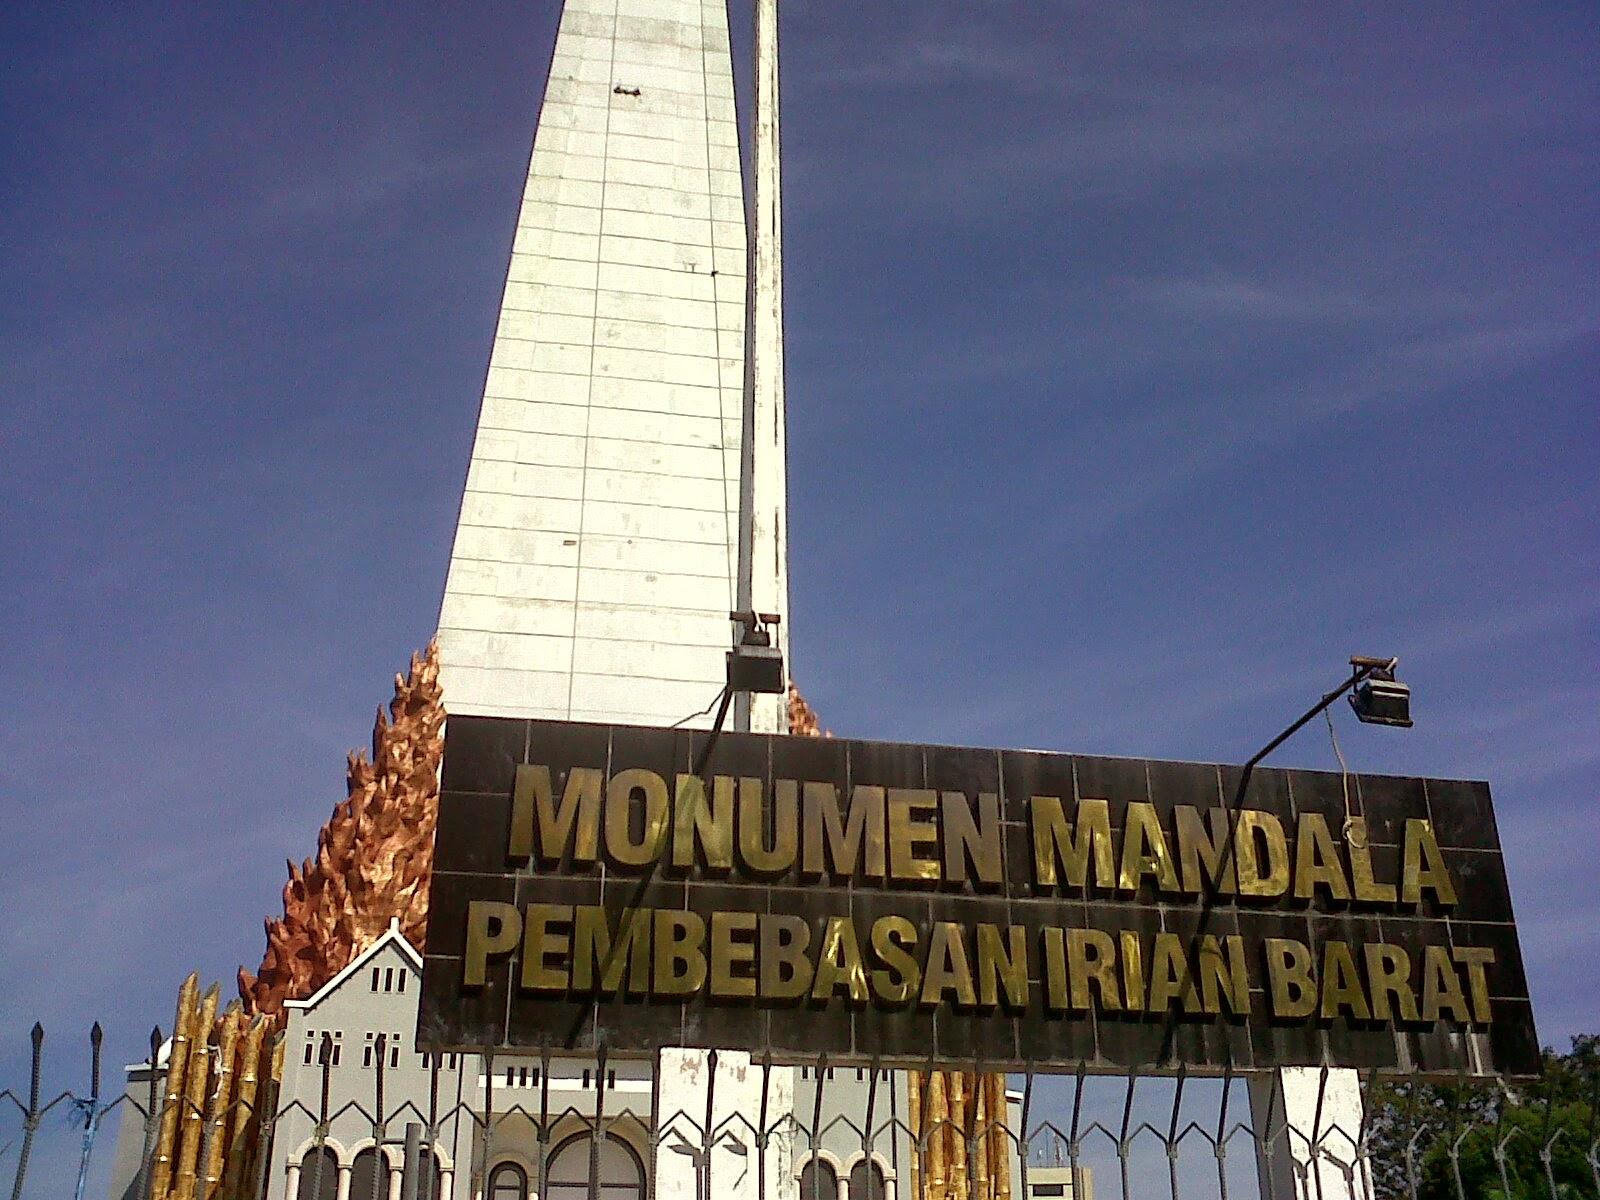 Monumen Mandala Makassar Pembebasan Irian Barat Kota